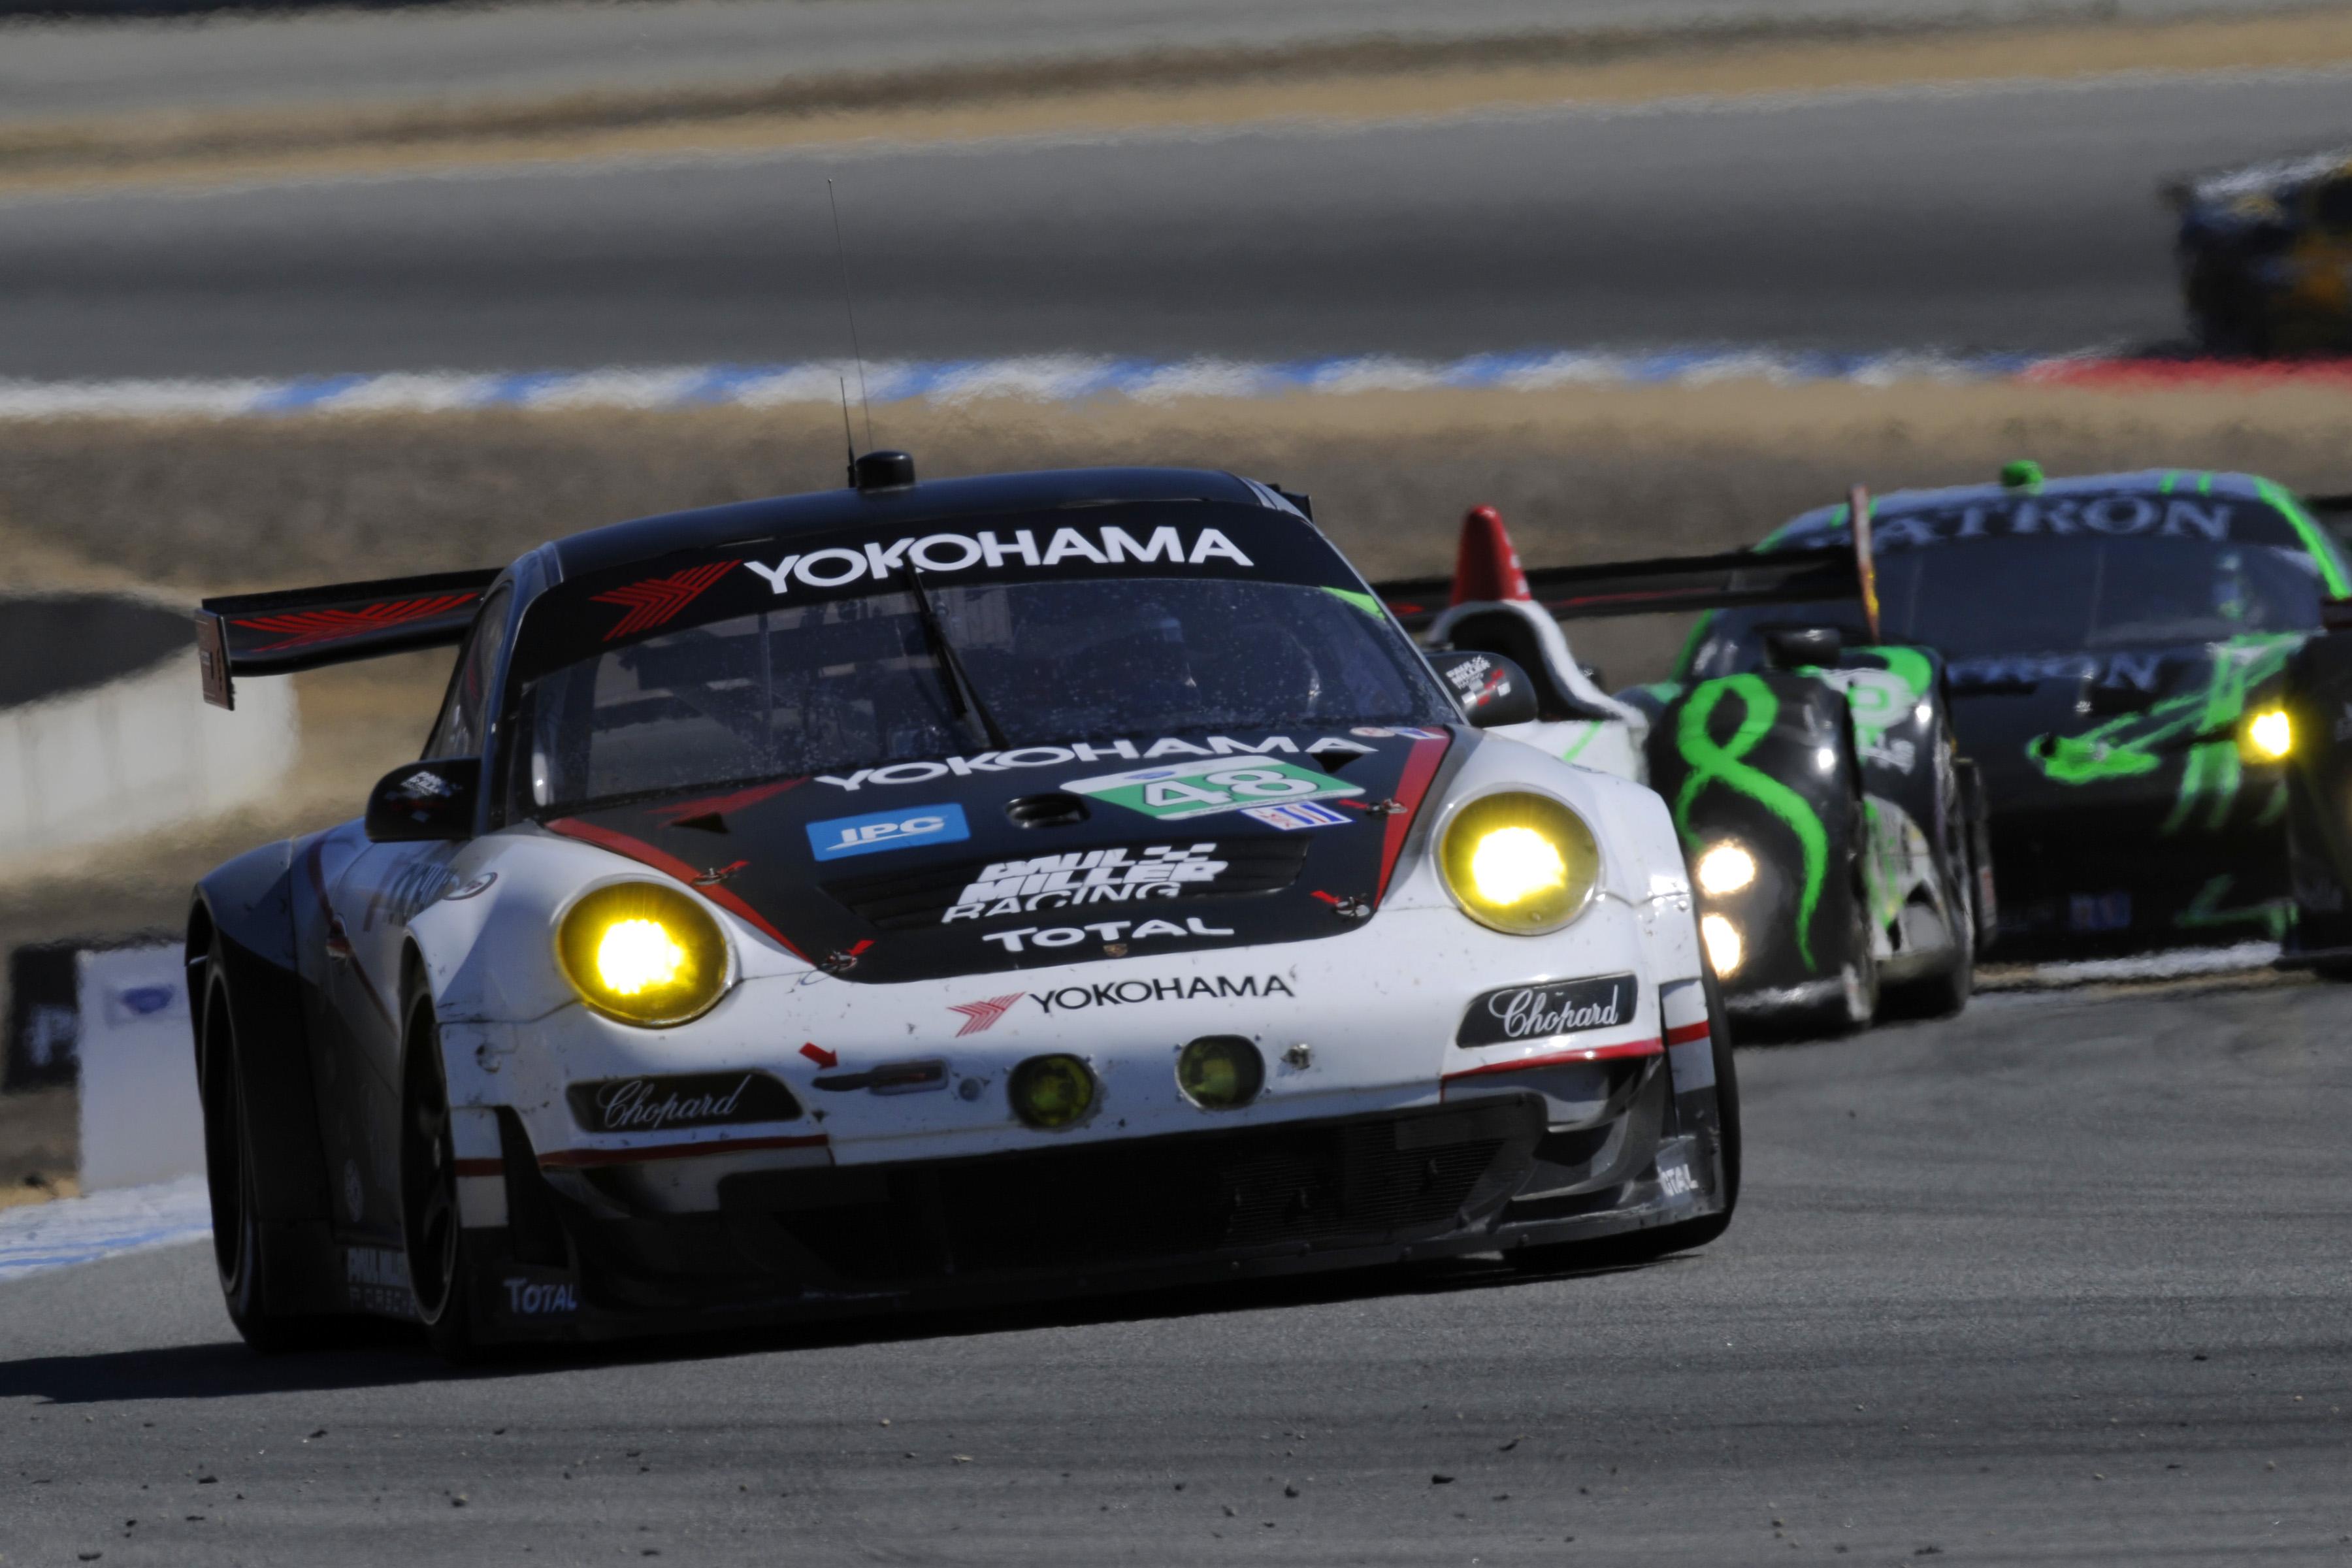 m11_3884_fine Inspiring Porsche 911 Gt1 Road atlanta Cars Trend